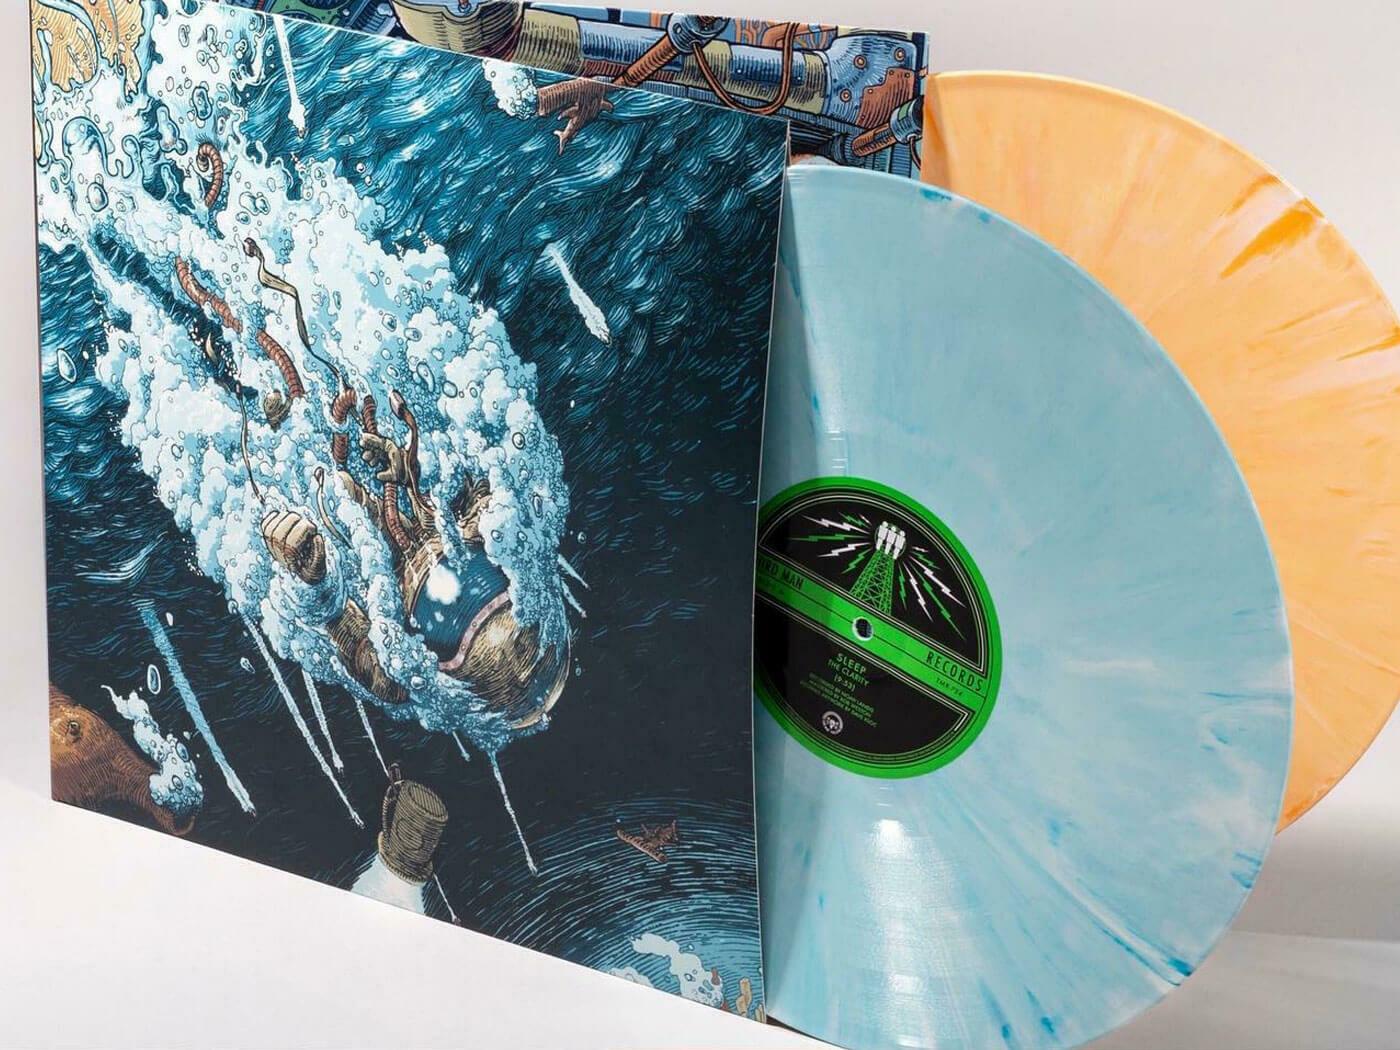 "Sleep ""Iommic Life (The Clarity / Leagues Beneath)"" *Ltd. Ed. Colored Vinyl*"